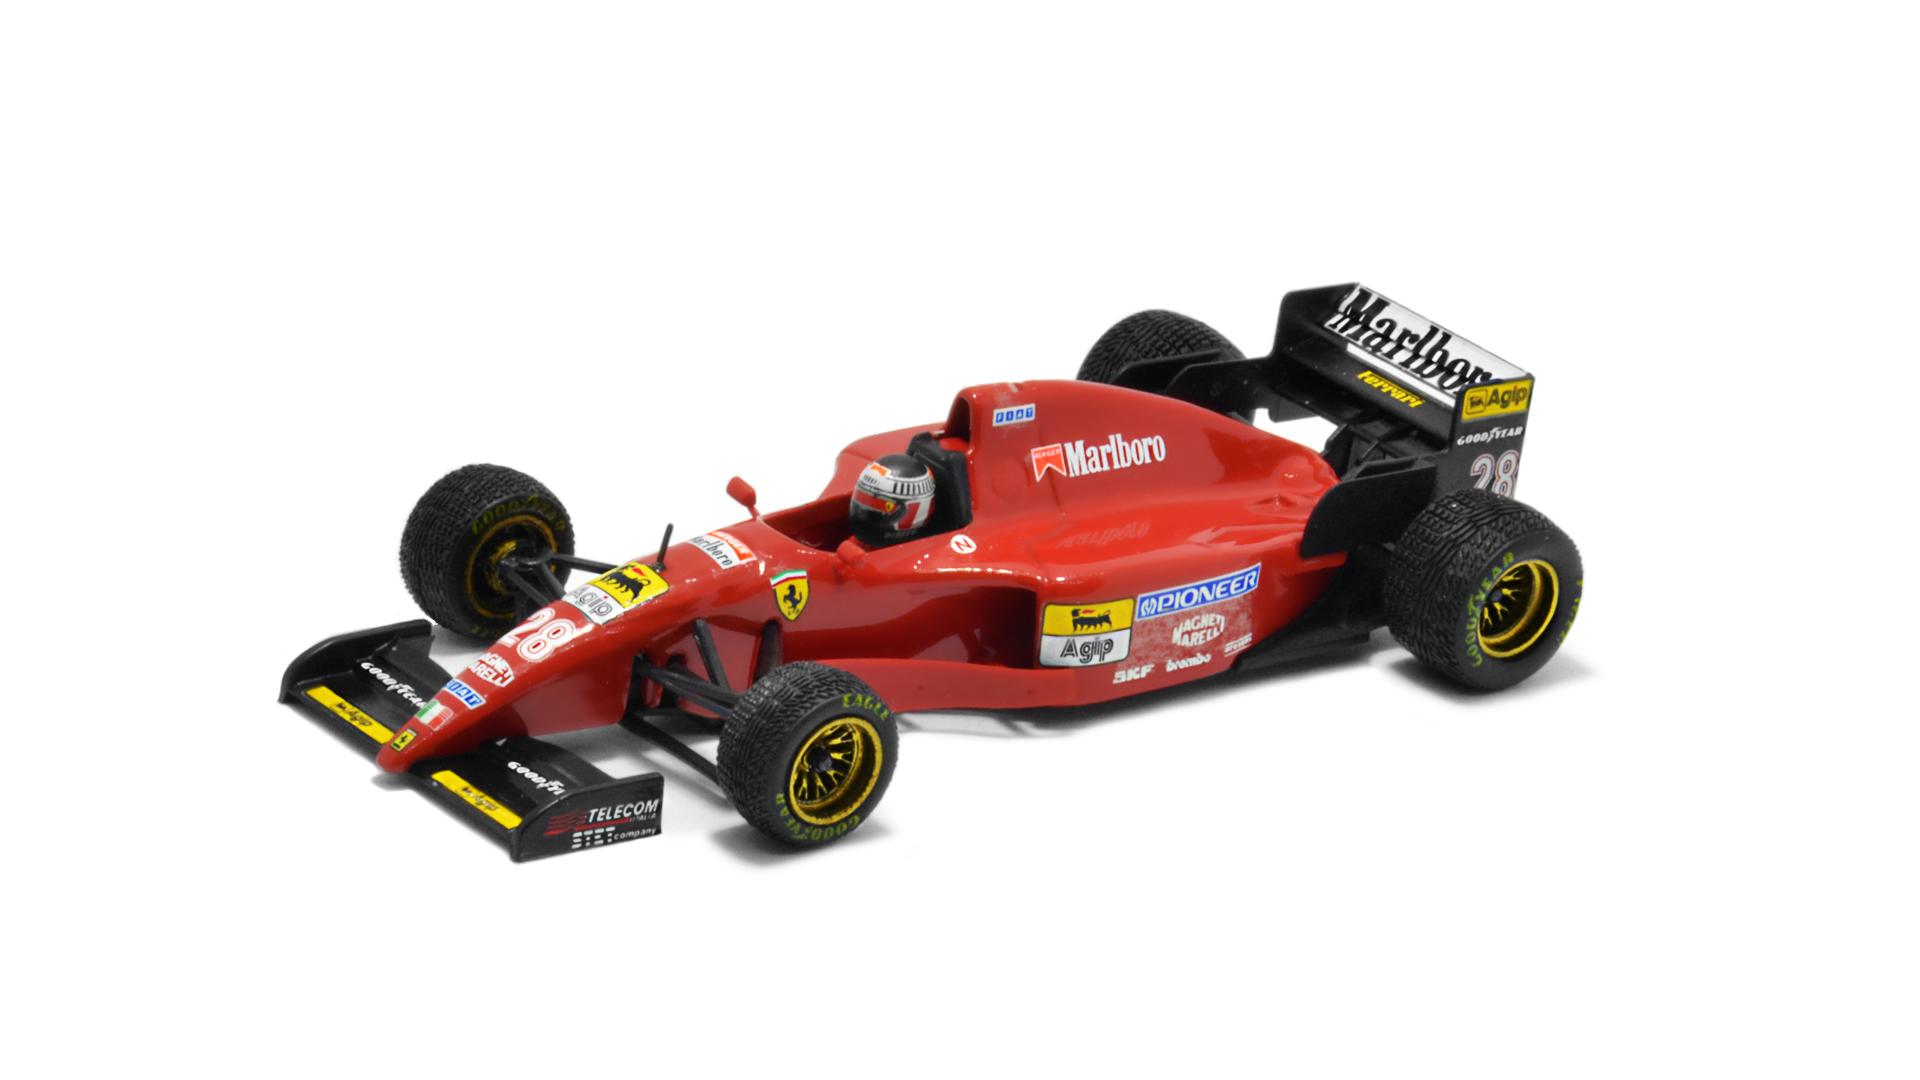 Év: 1995<br />Modell: F412T2<br />Gyártó: Onyx<br />Pilóta: Gerhard Berger